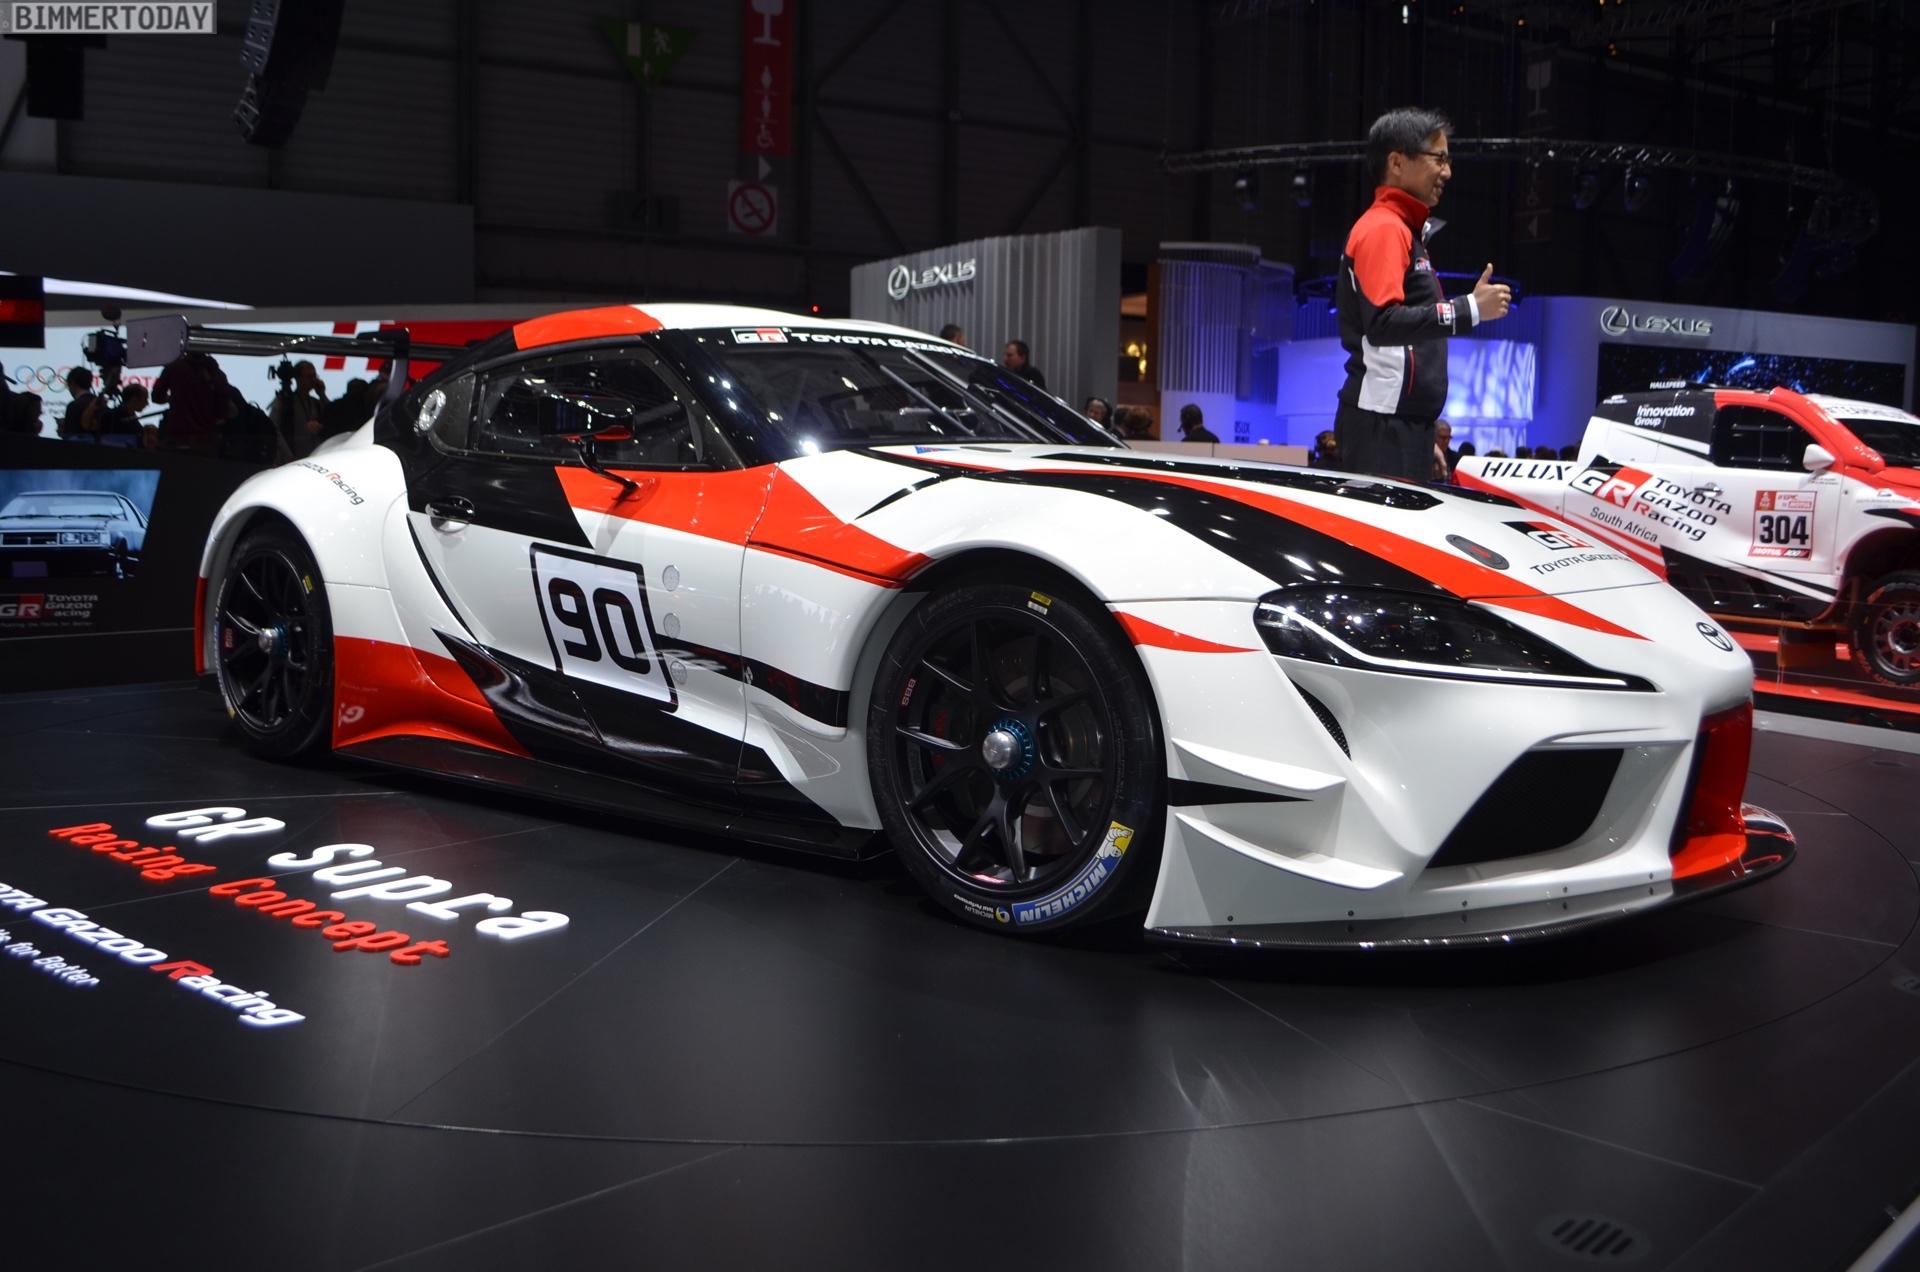 Genf 2018 Toyota Gr Supra Racing Concept Gazoo Live 01 830x550